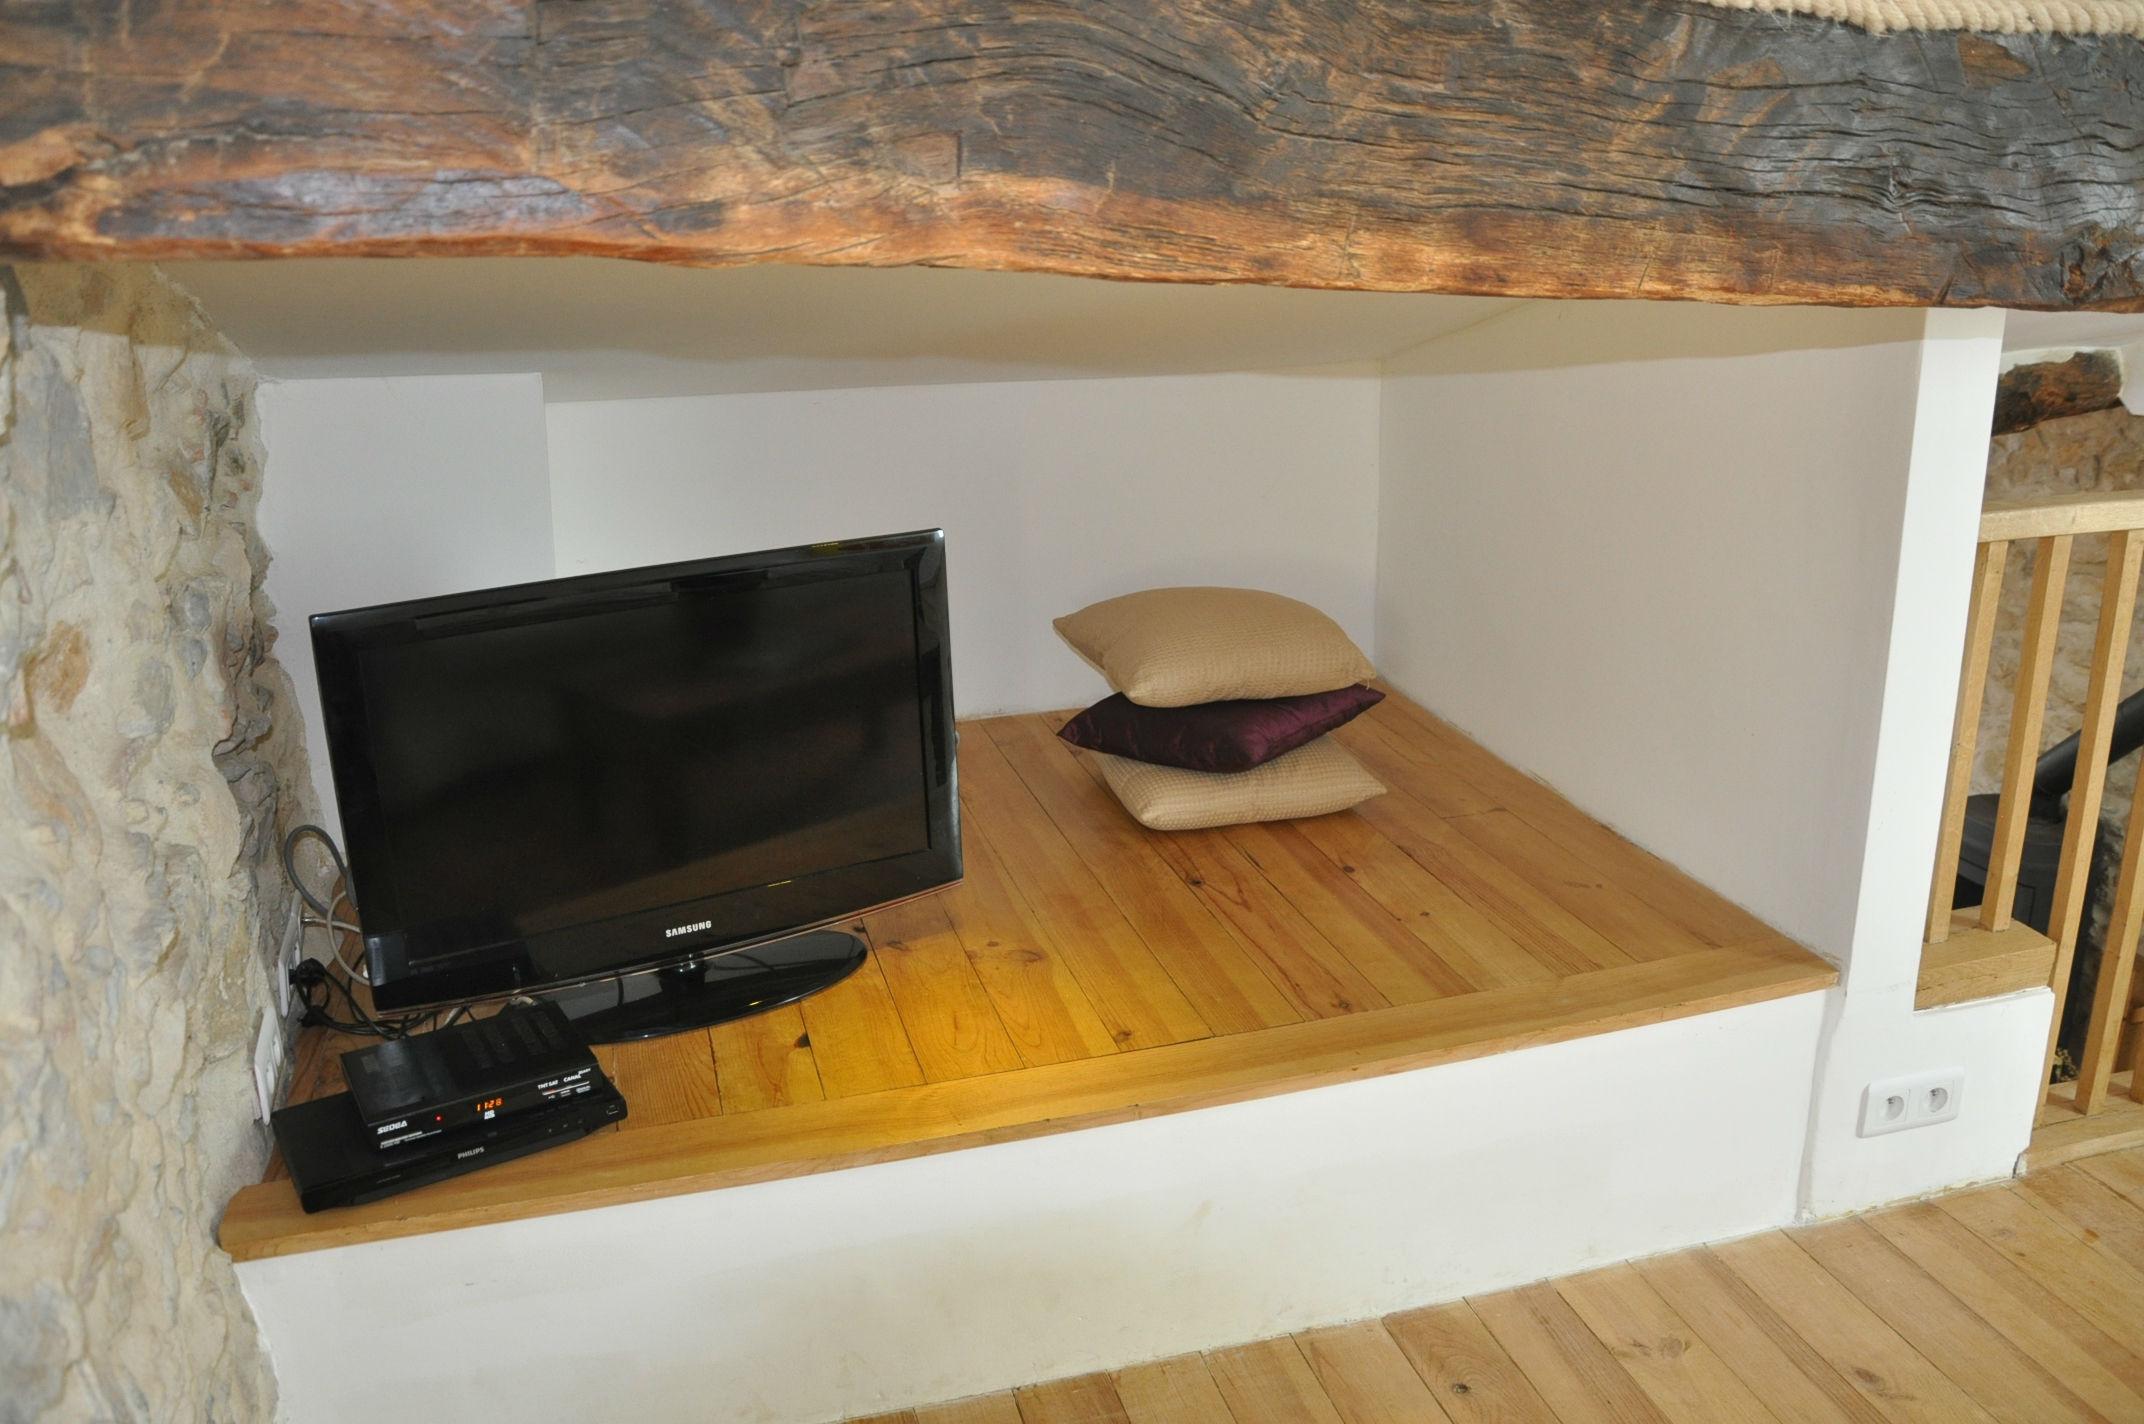 Flatscreen TV DVD Satellite and ipad-HDMI.jpg